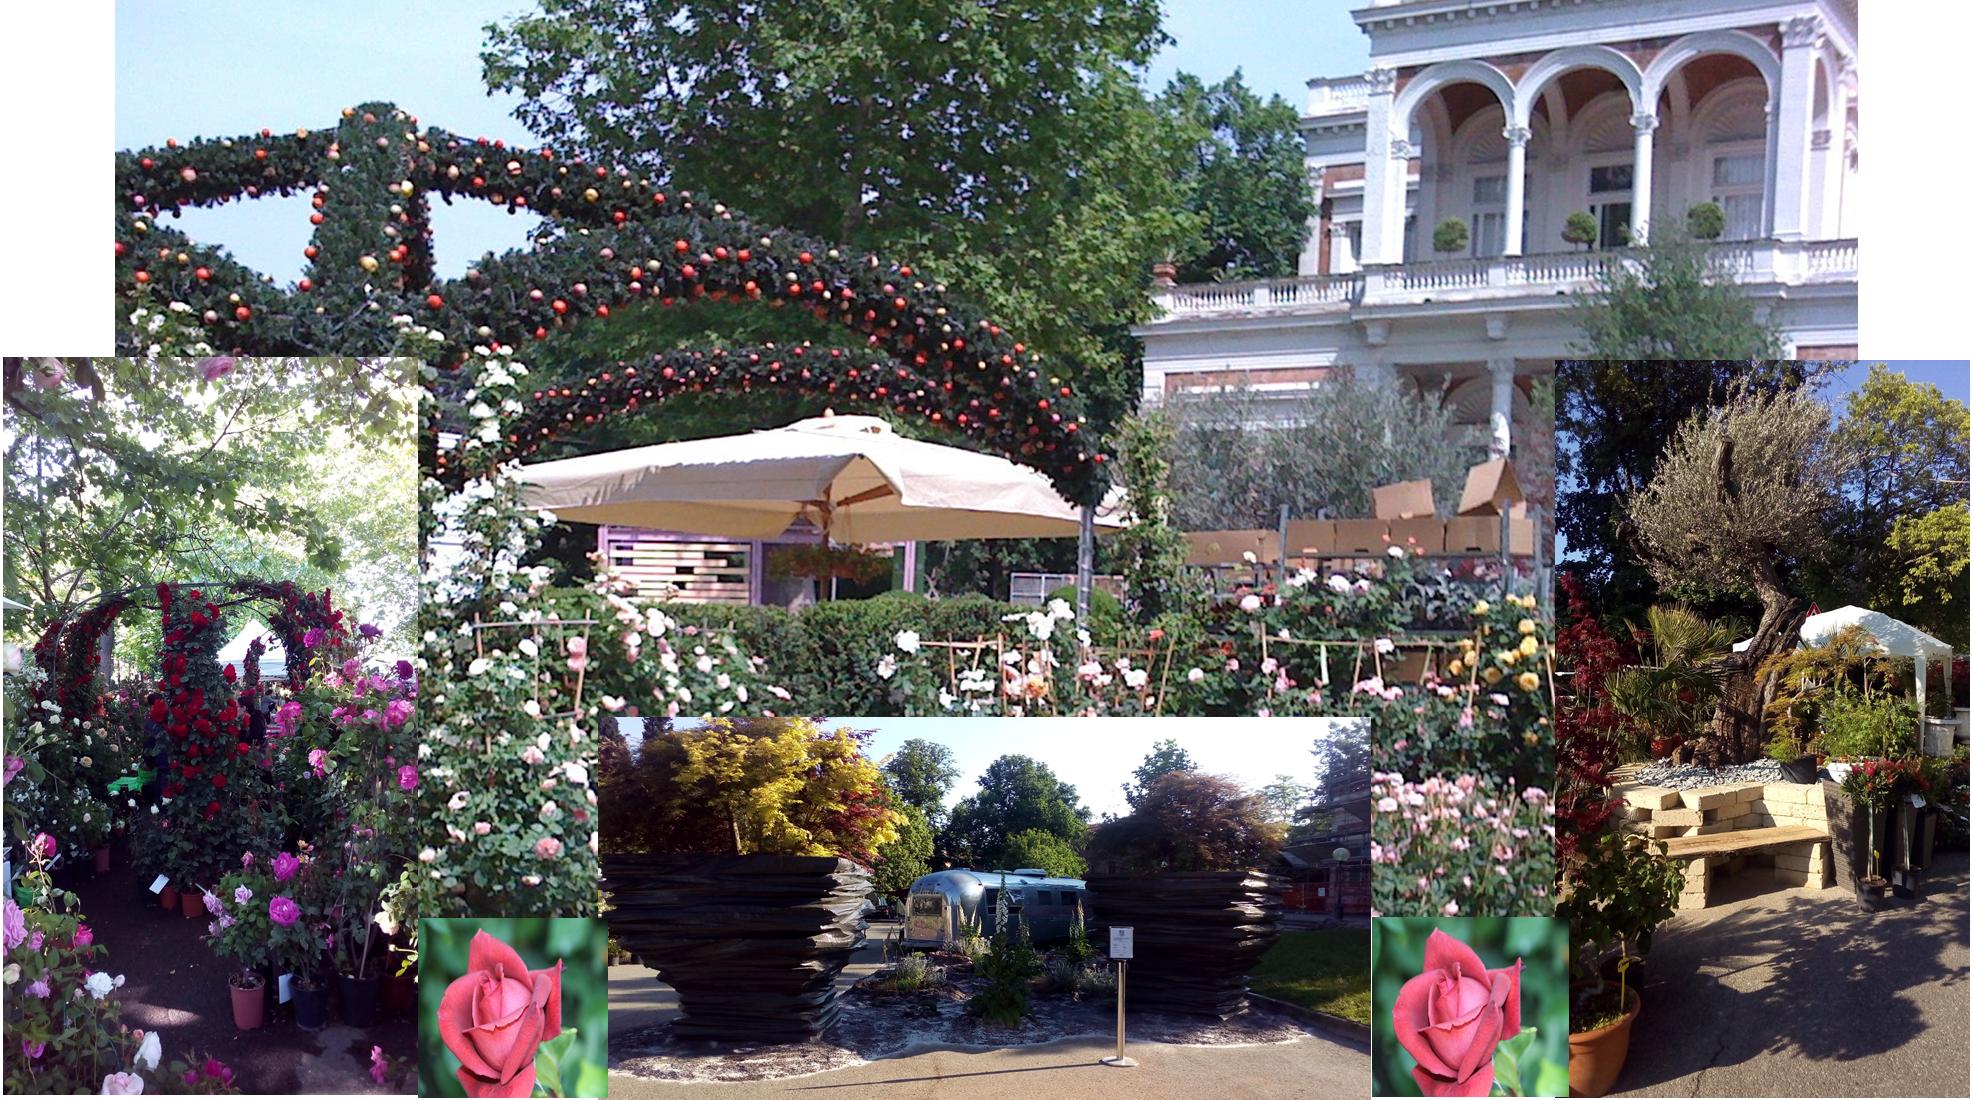 giardini & terrazzi | garden show & mostra mercato - Giardini E Terrazzi Garden Show Mostra Mercato